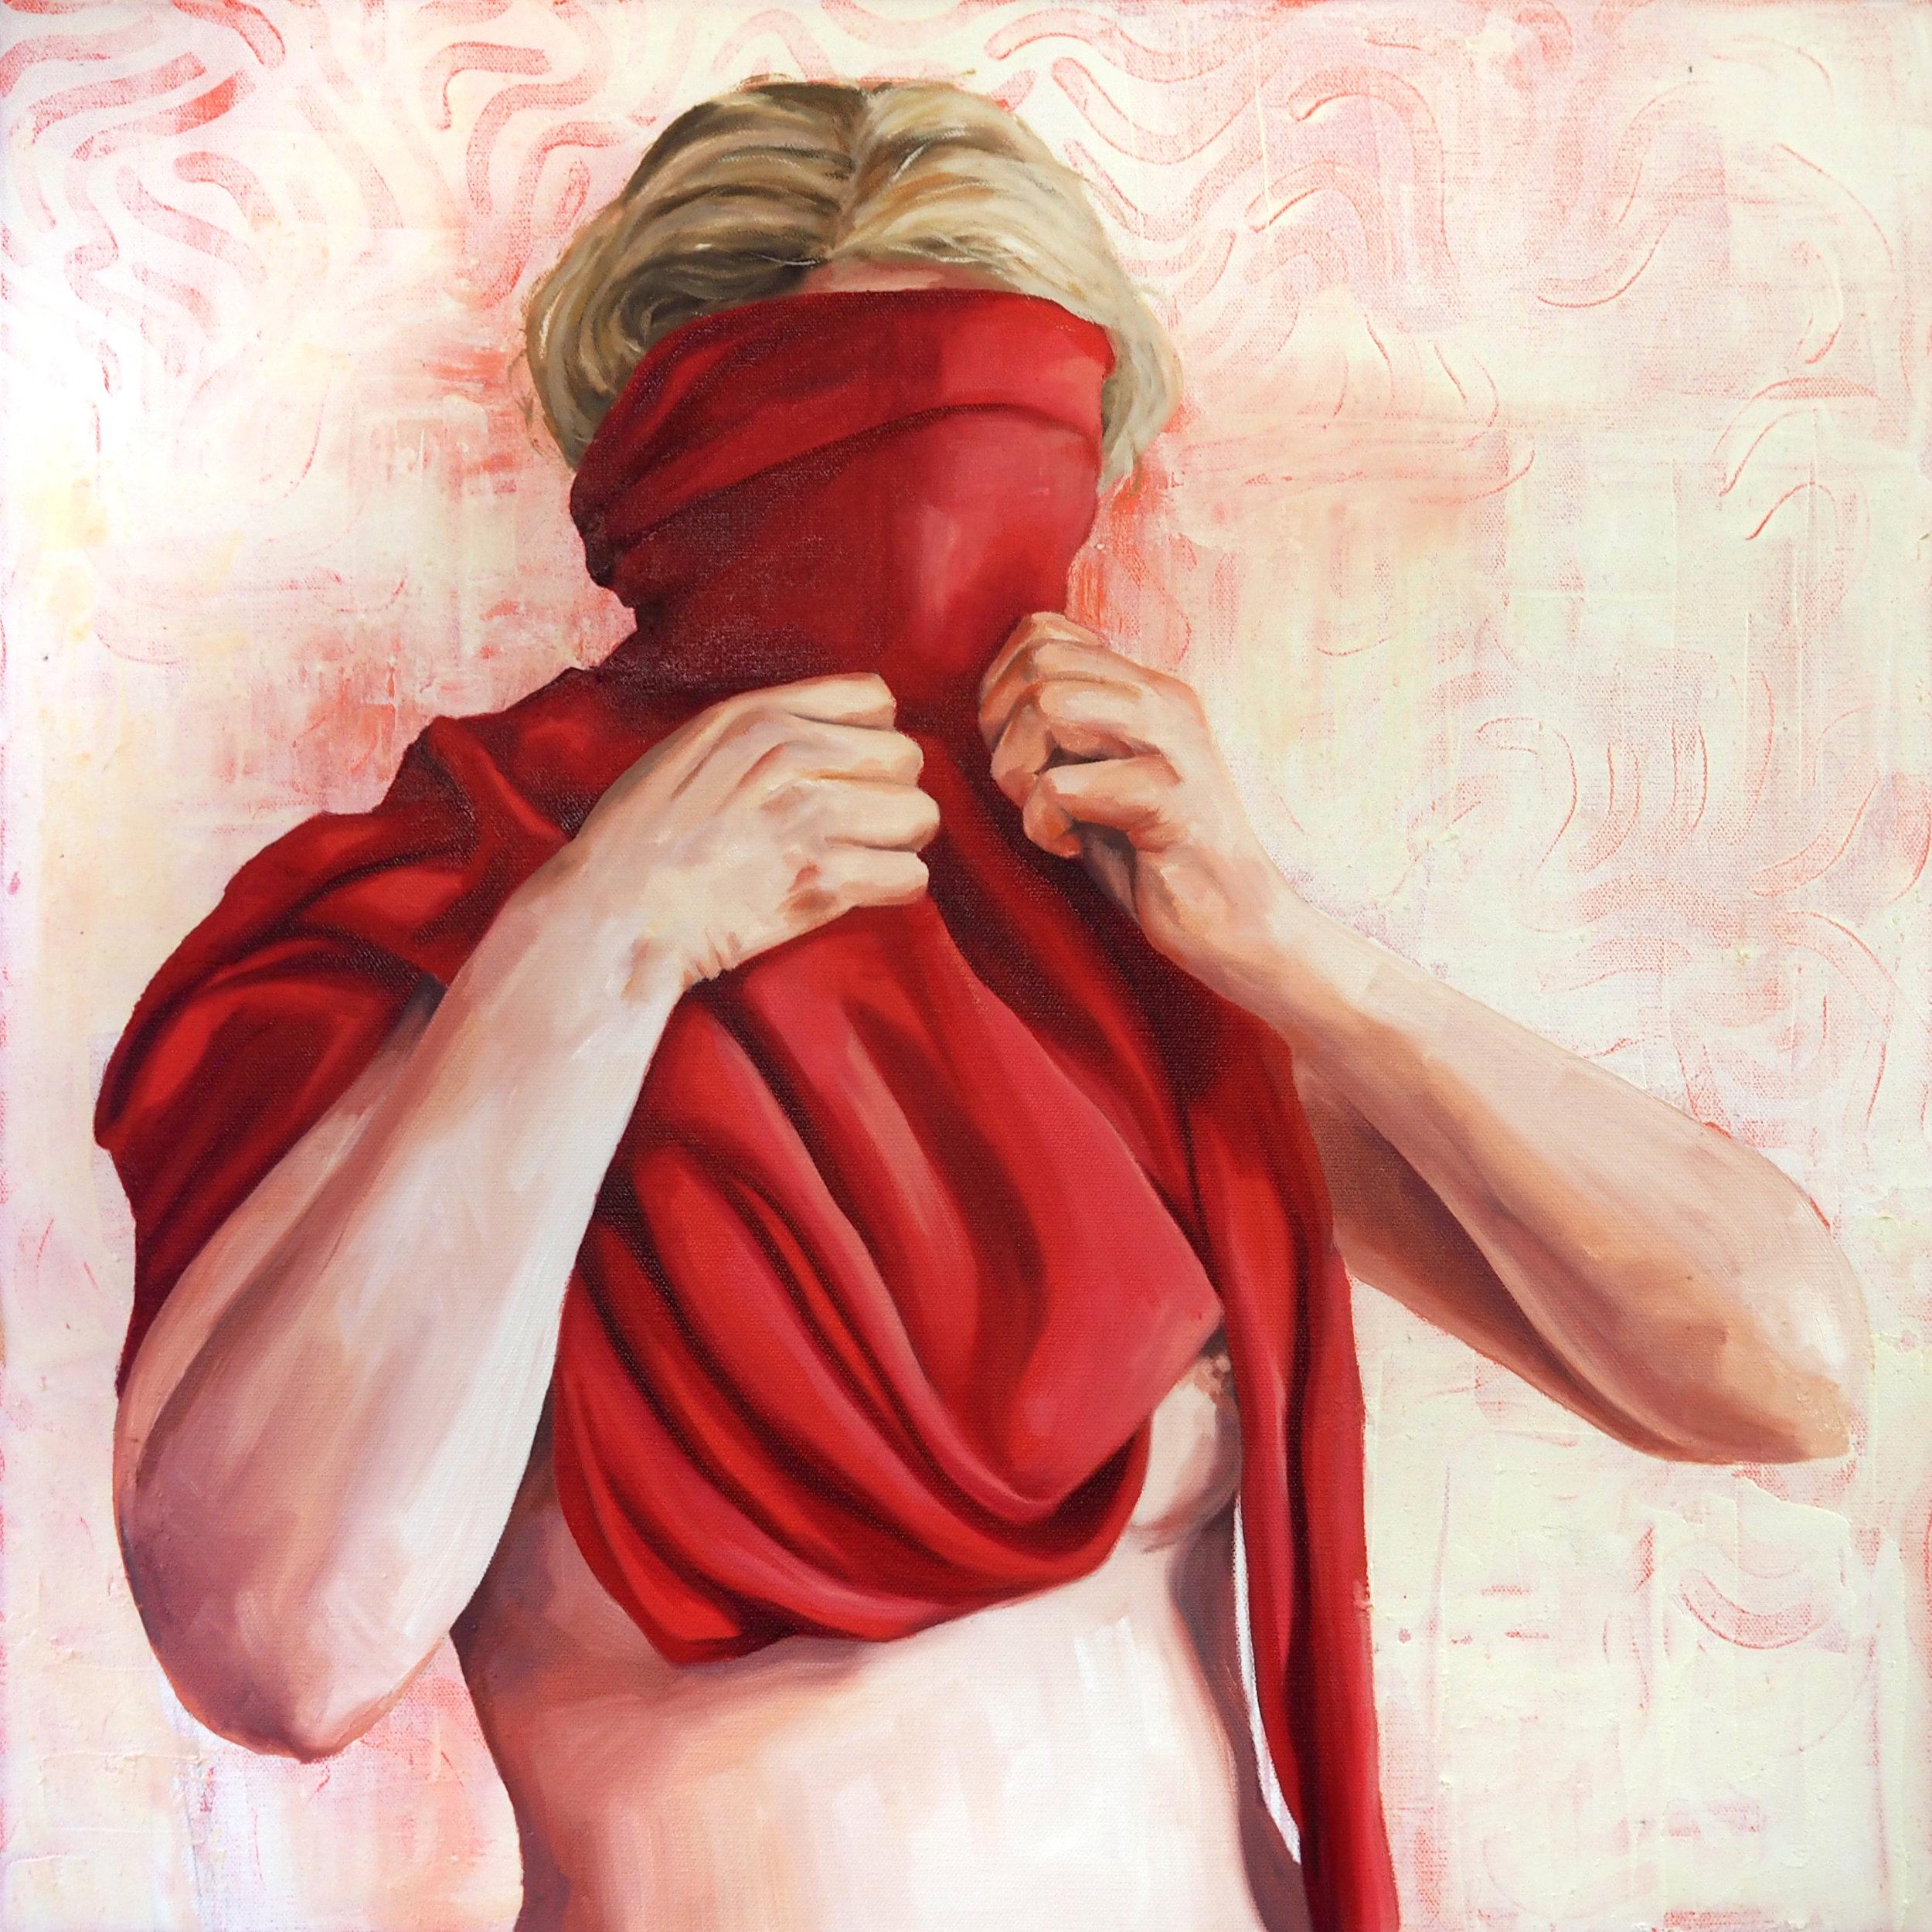 """Try on Feminine"" 24x24 Oil on Canvas"